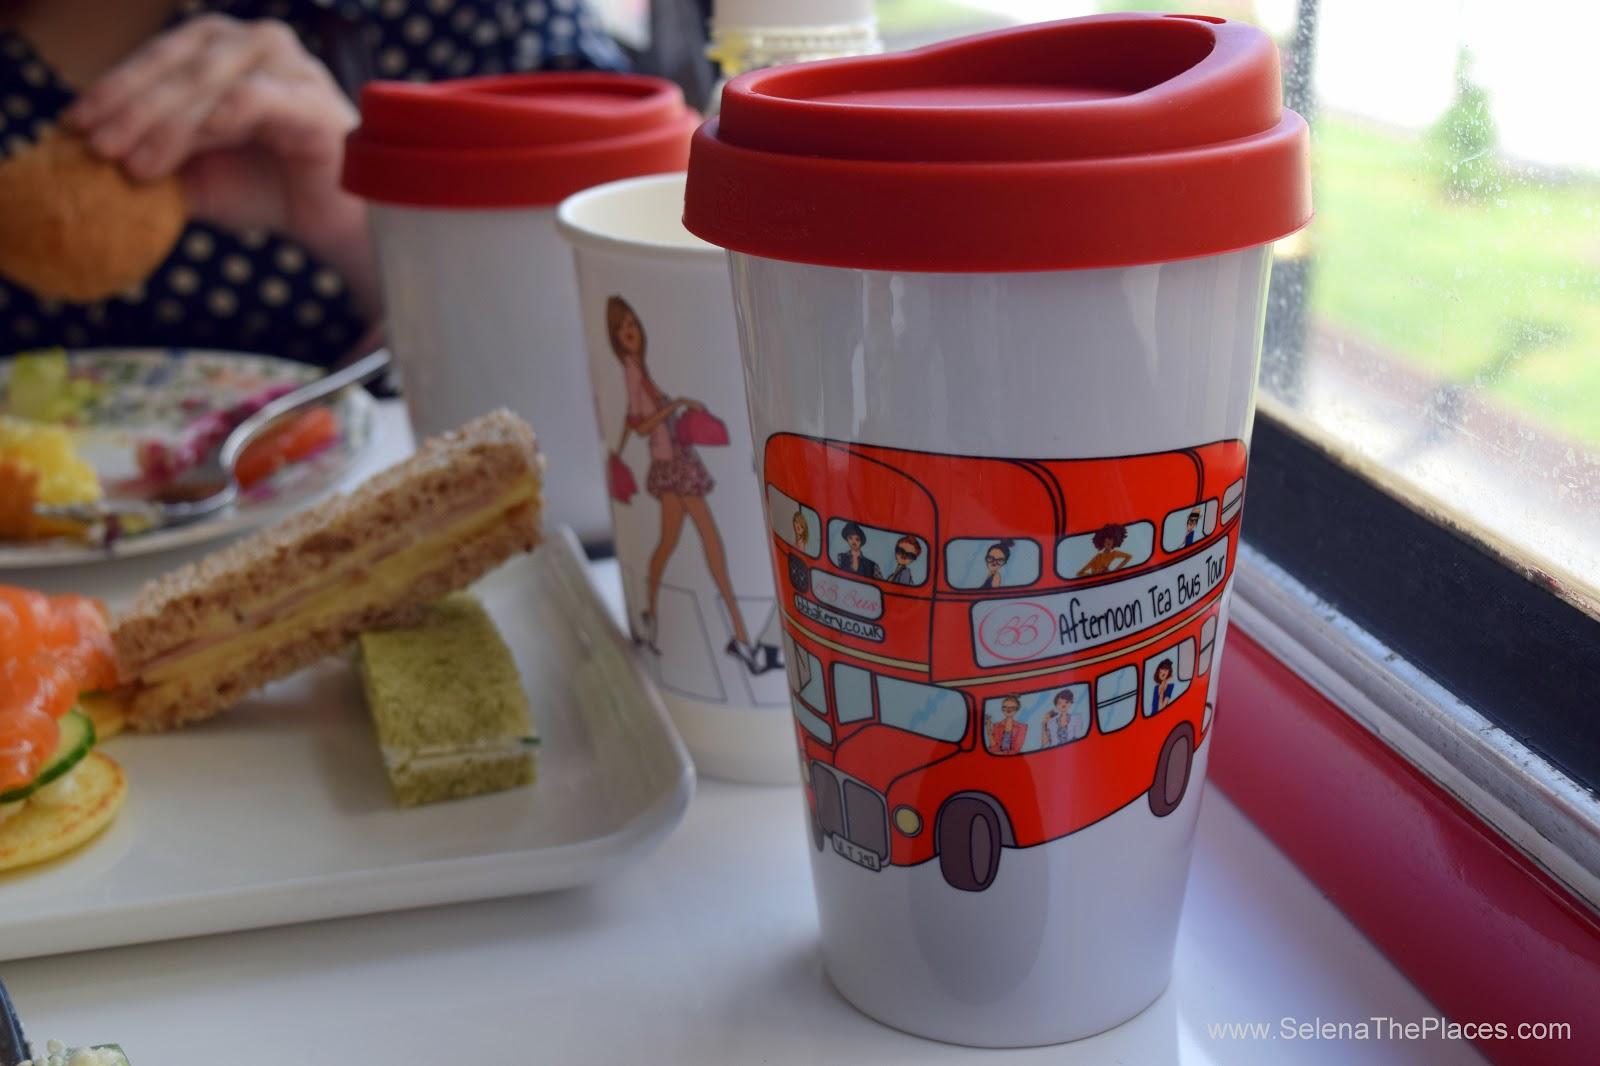 London Afternoon Tea Bus Tour